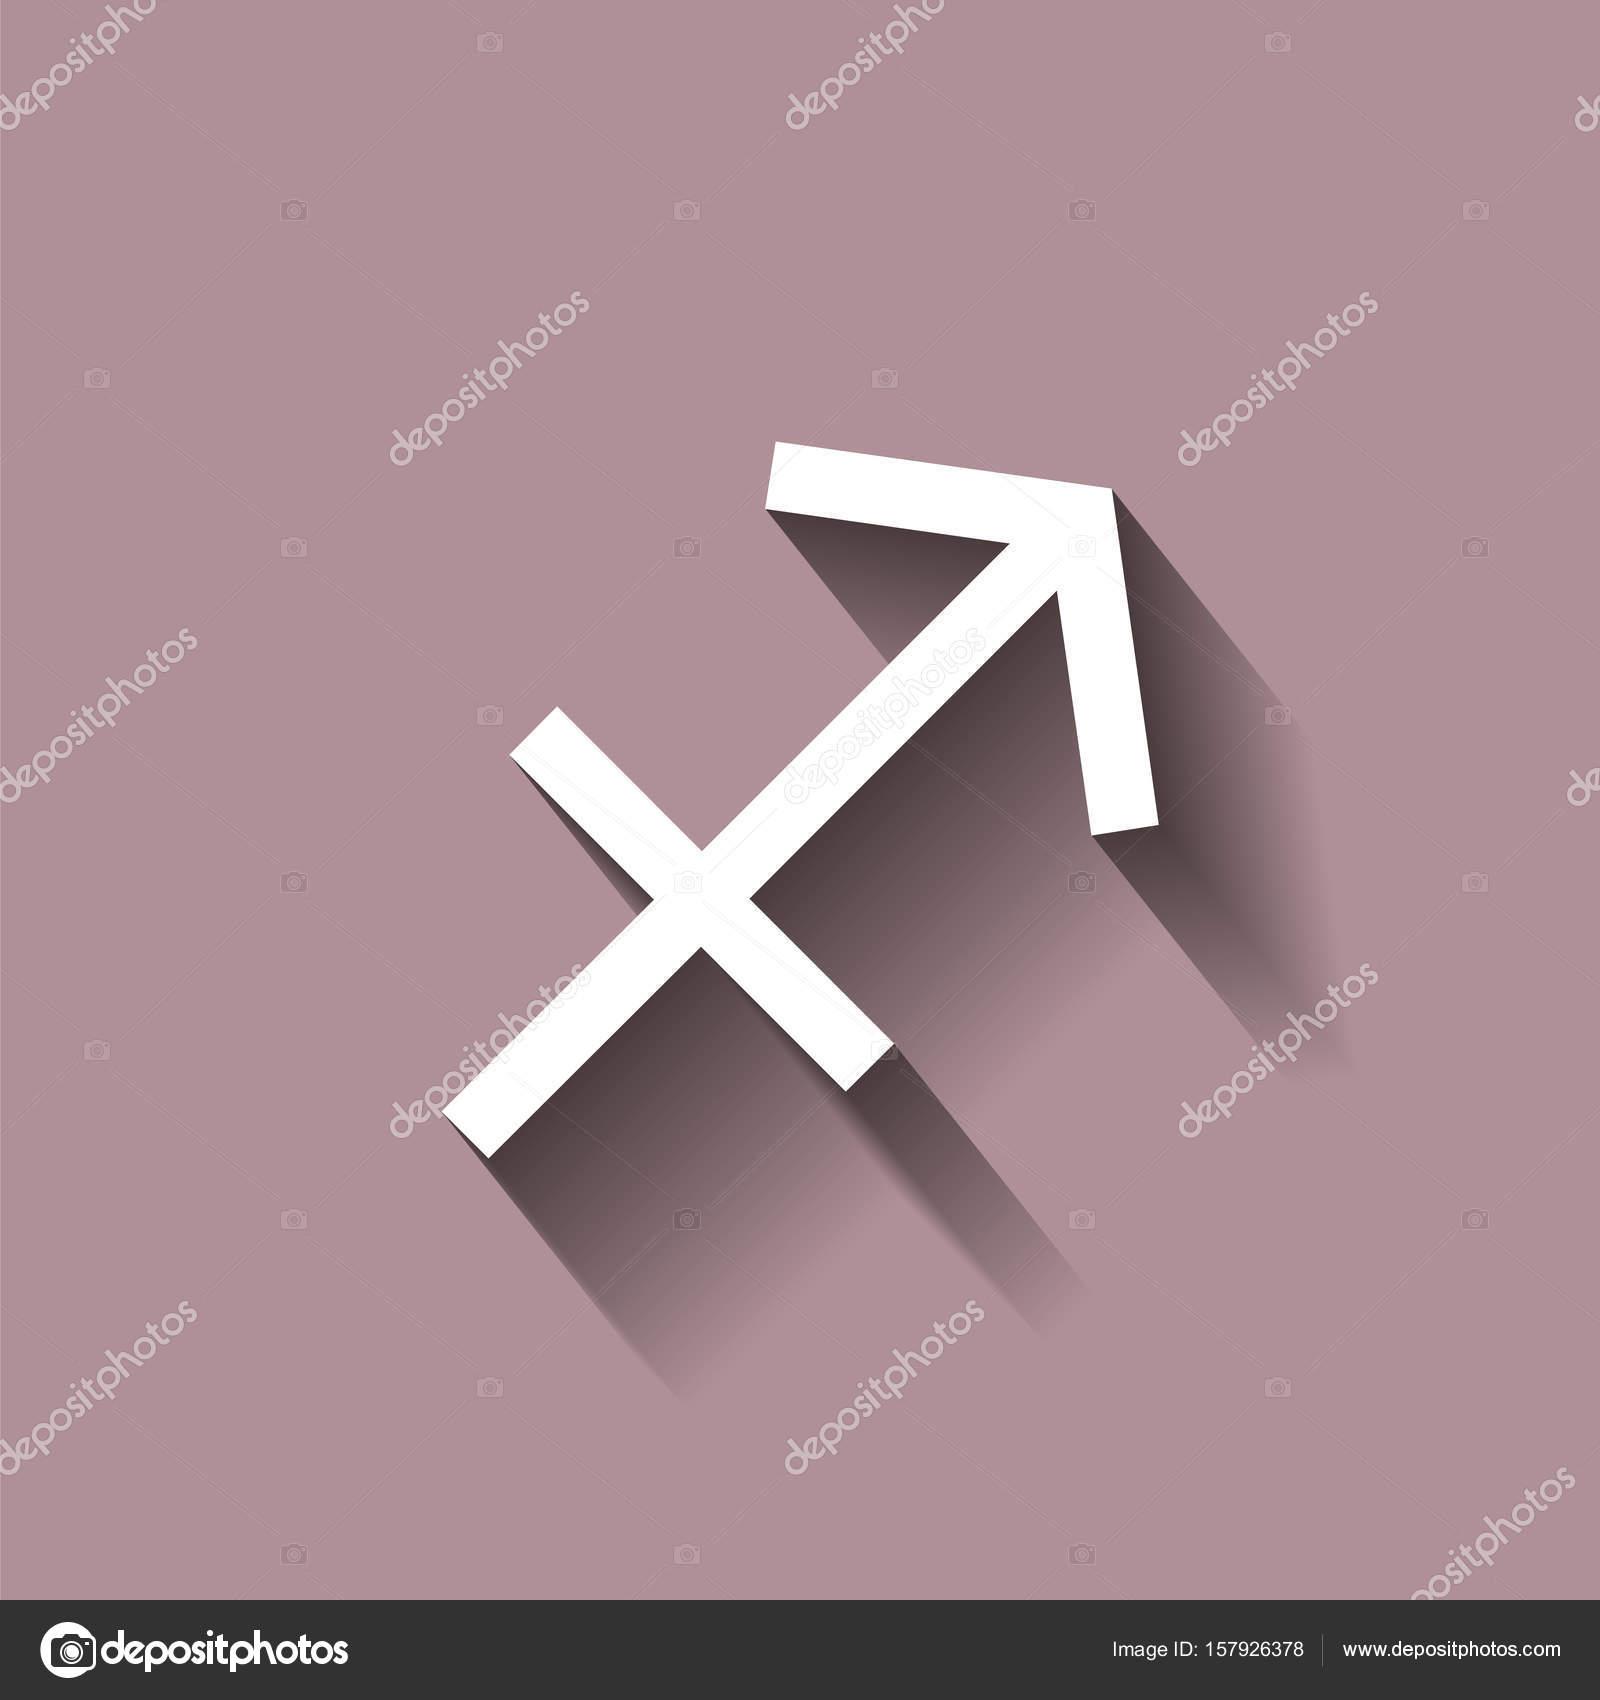 Sagittarius zodiac sign astrological symbol icon with shadow sagittarius zodiac sign astrological symbol icon with shadow stock vector biocorpaavc